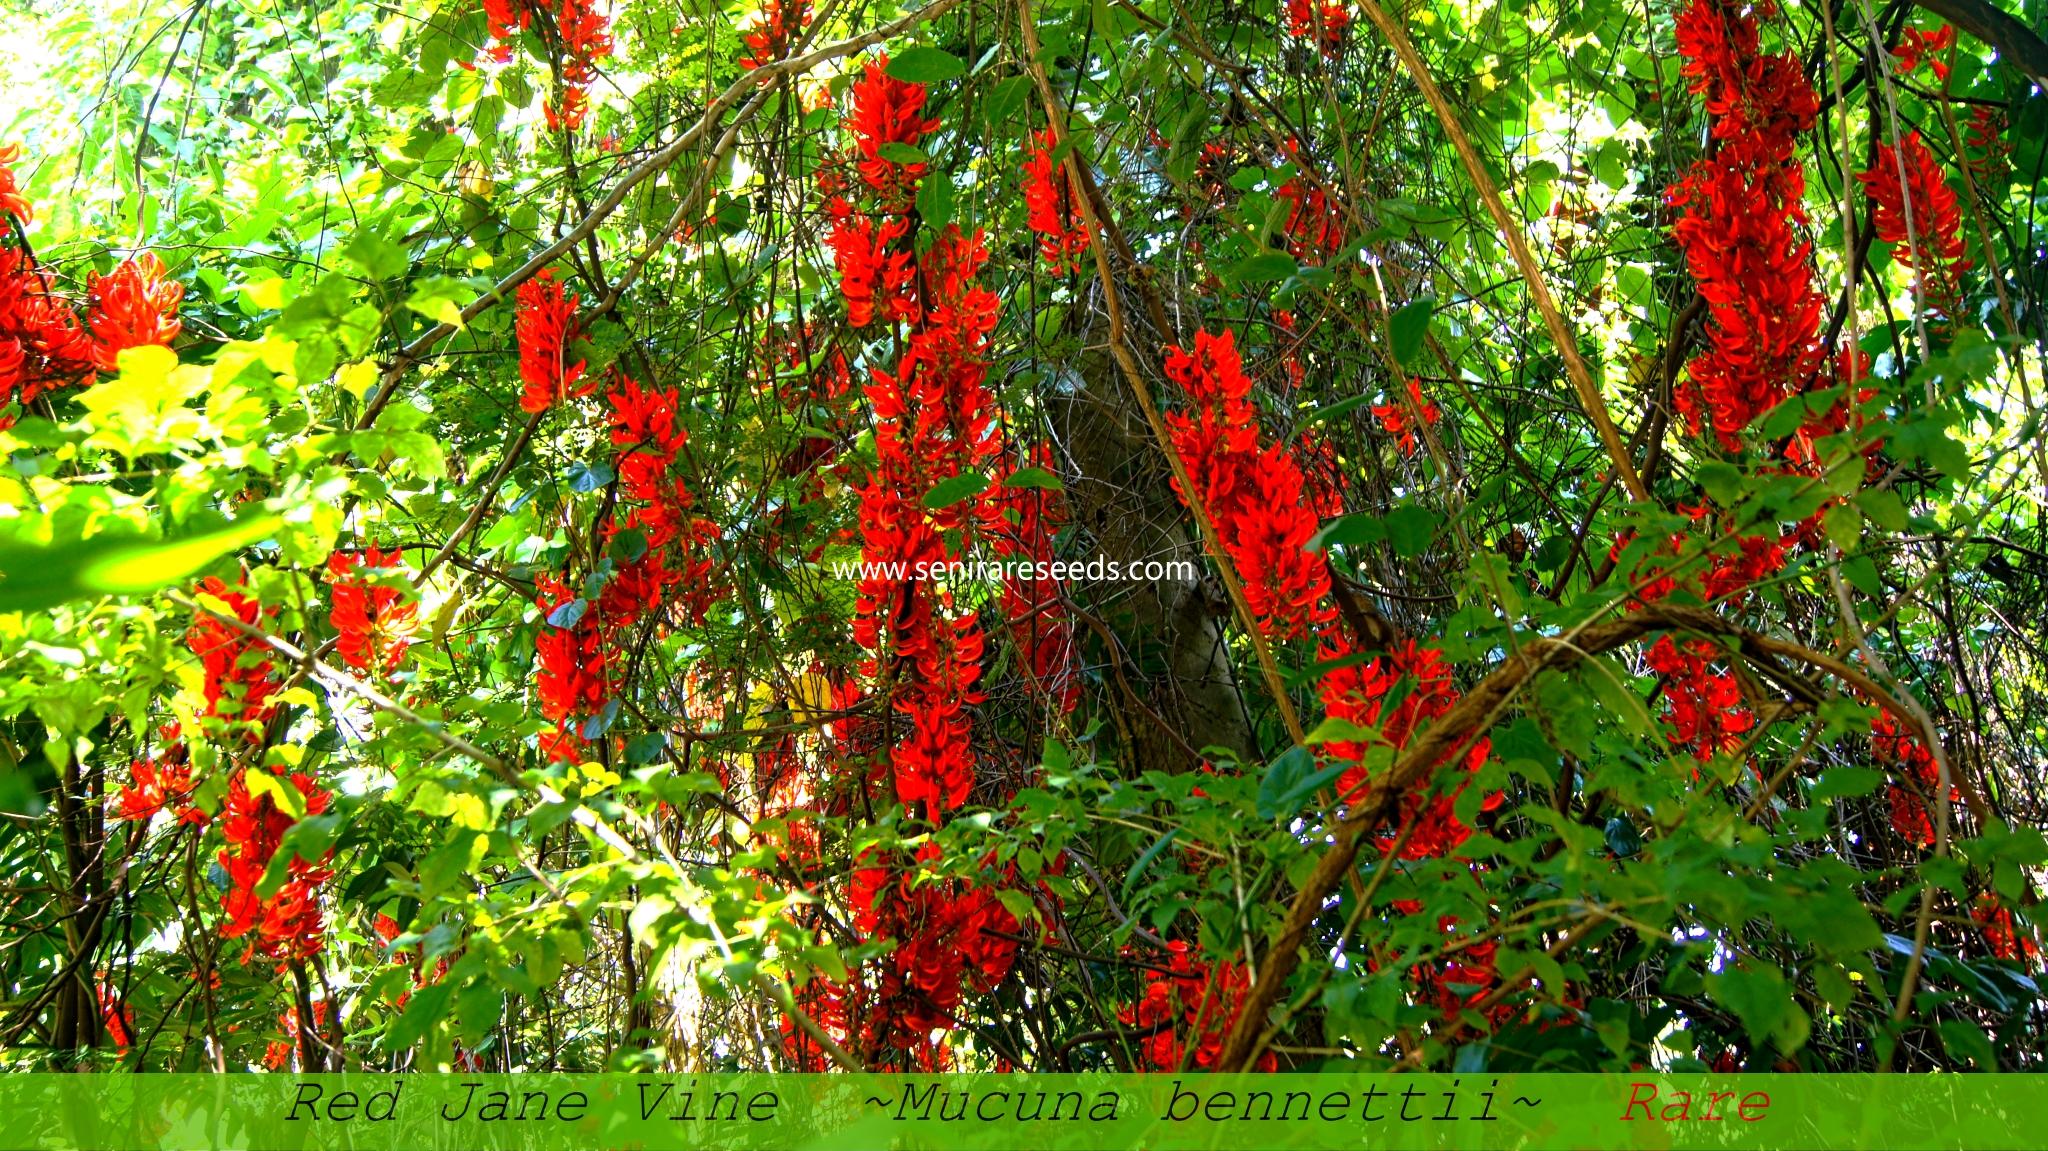 Red Jade Vine Seeds